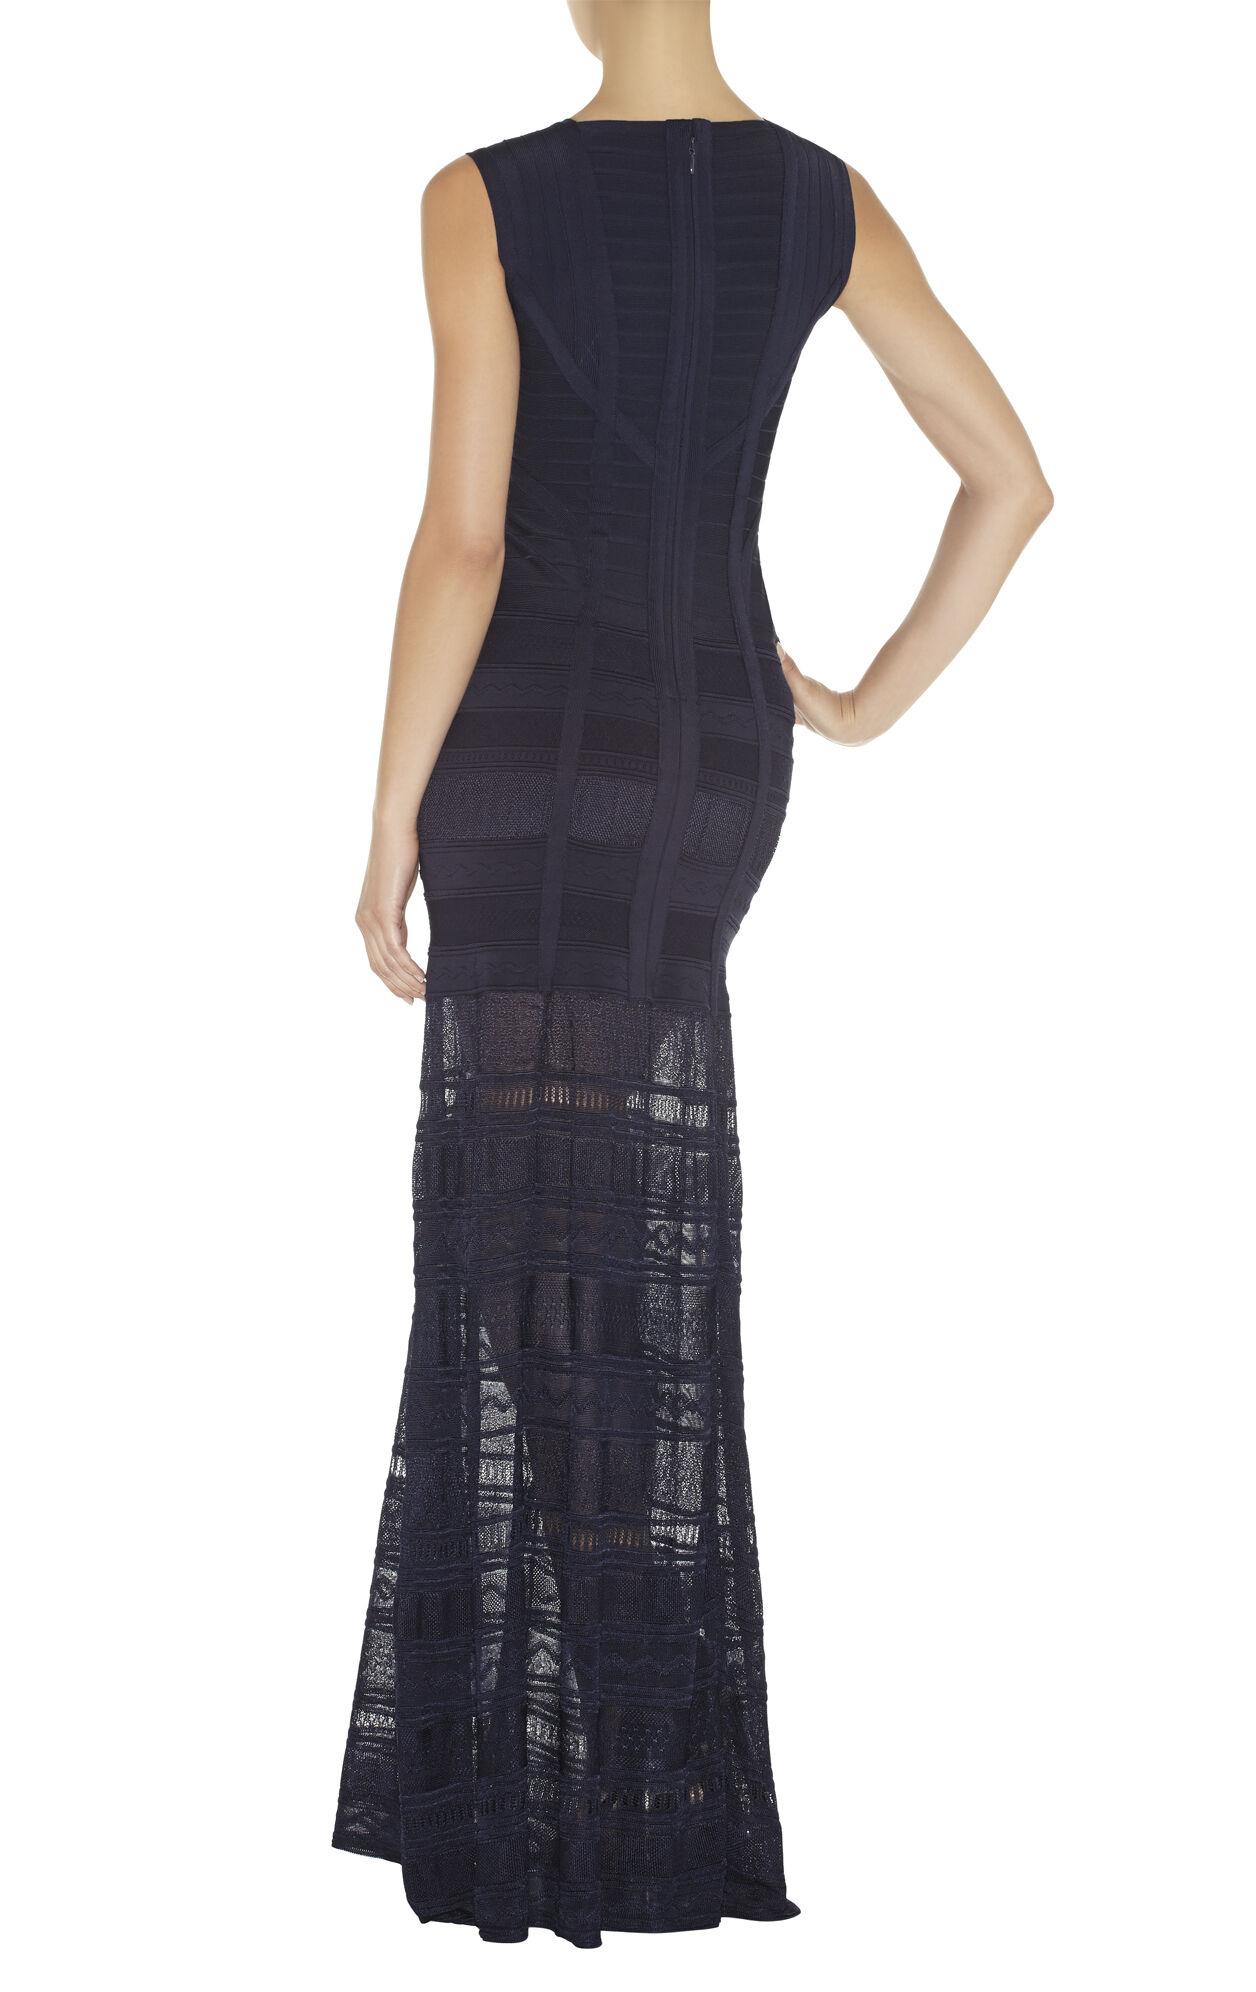 Miriam Pointelle Dress